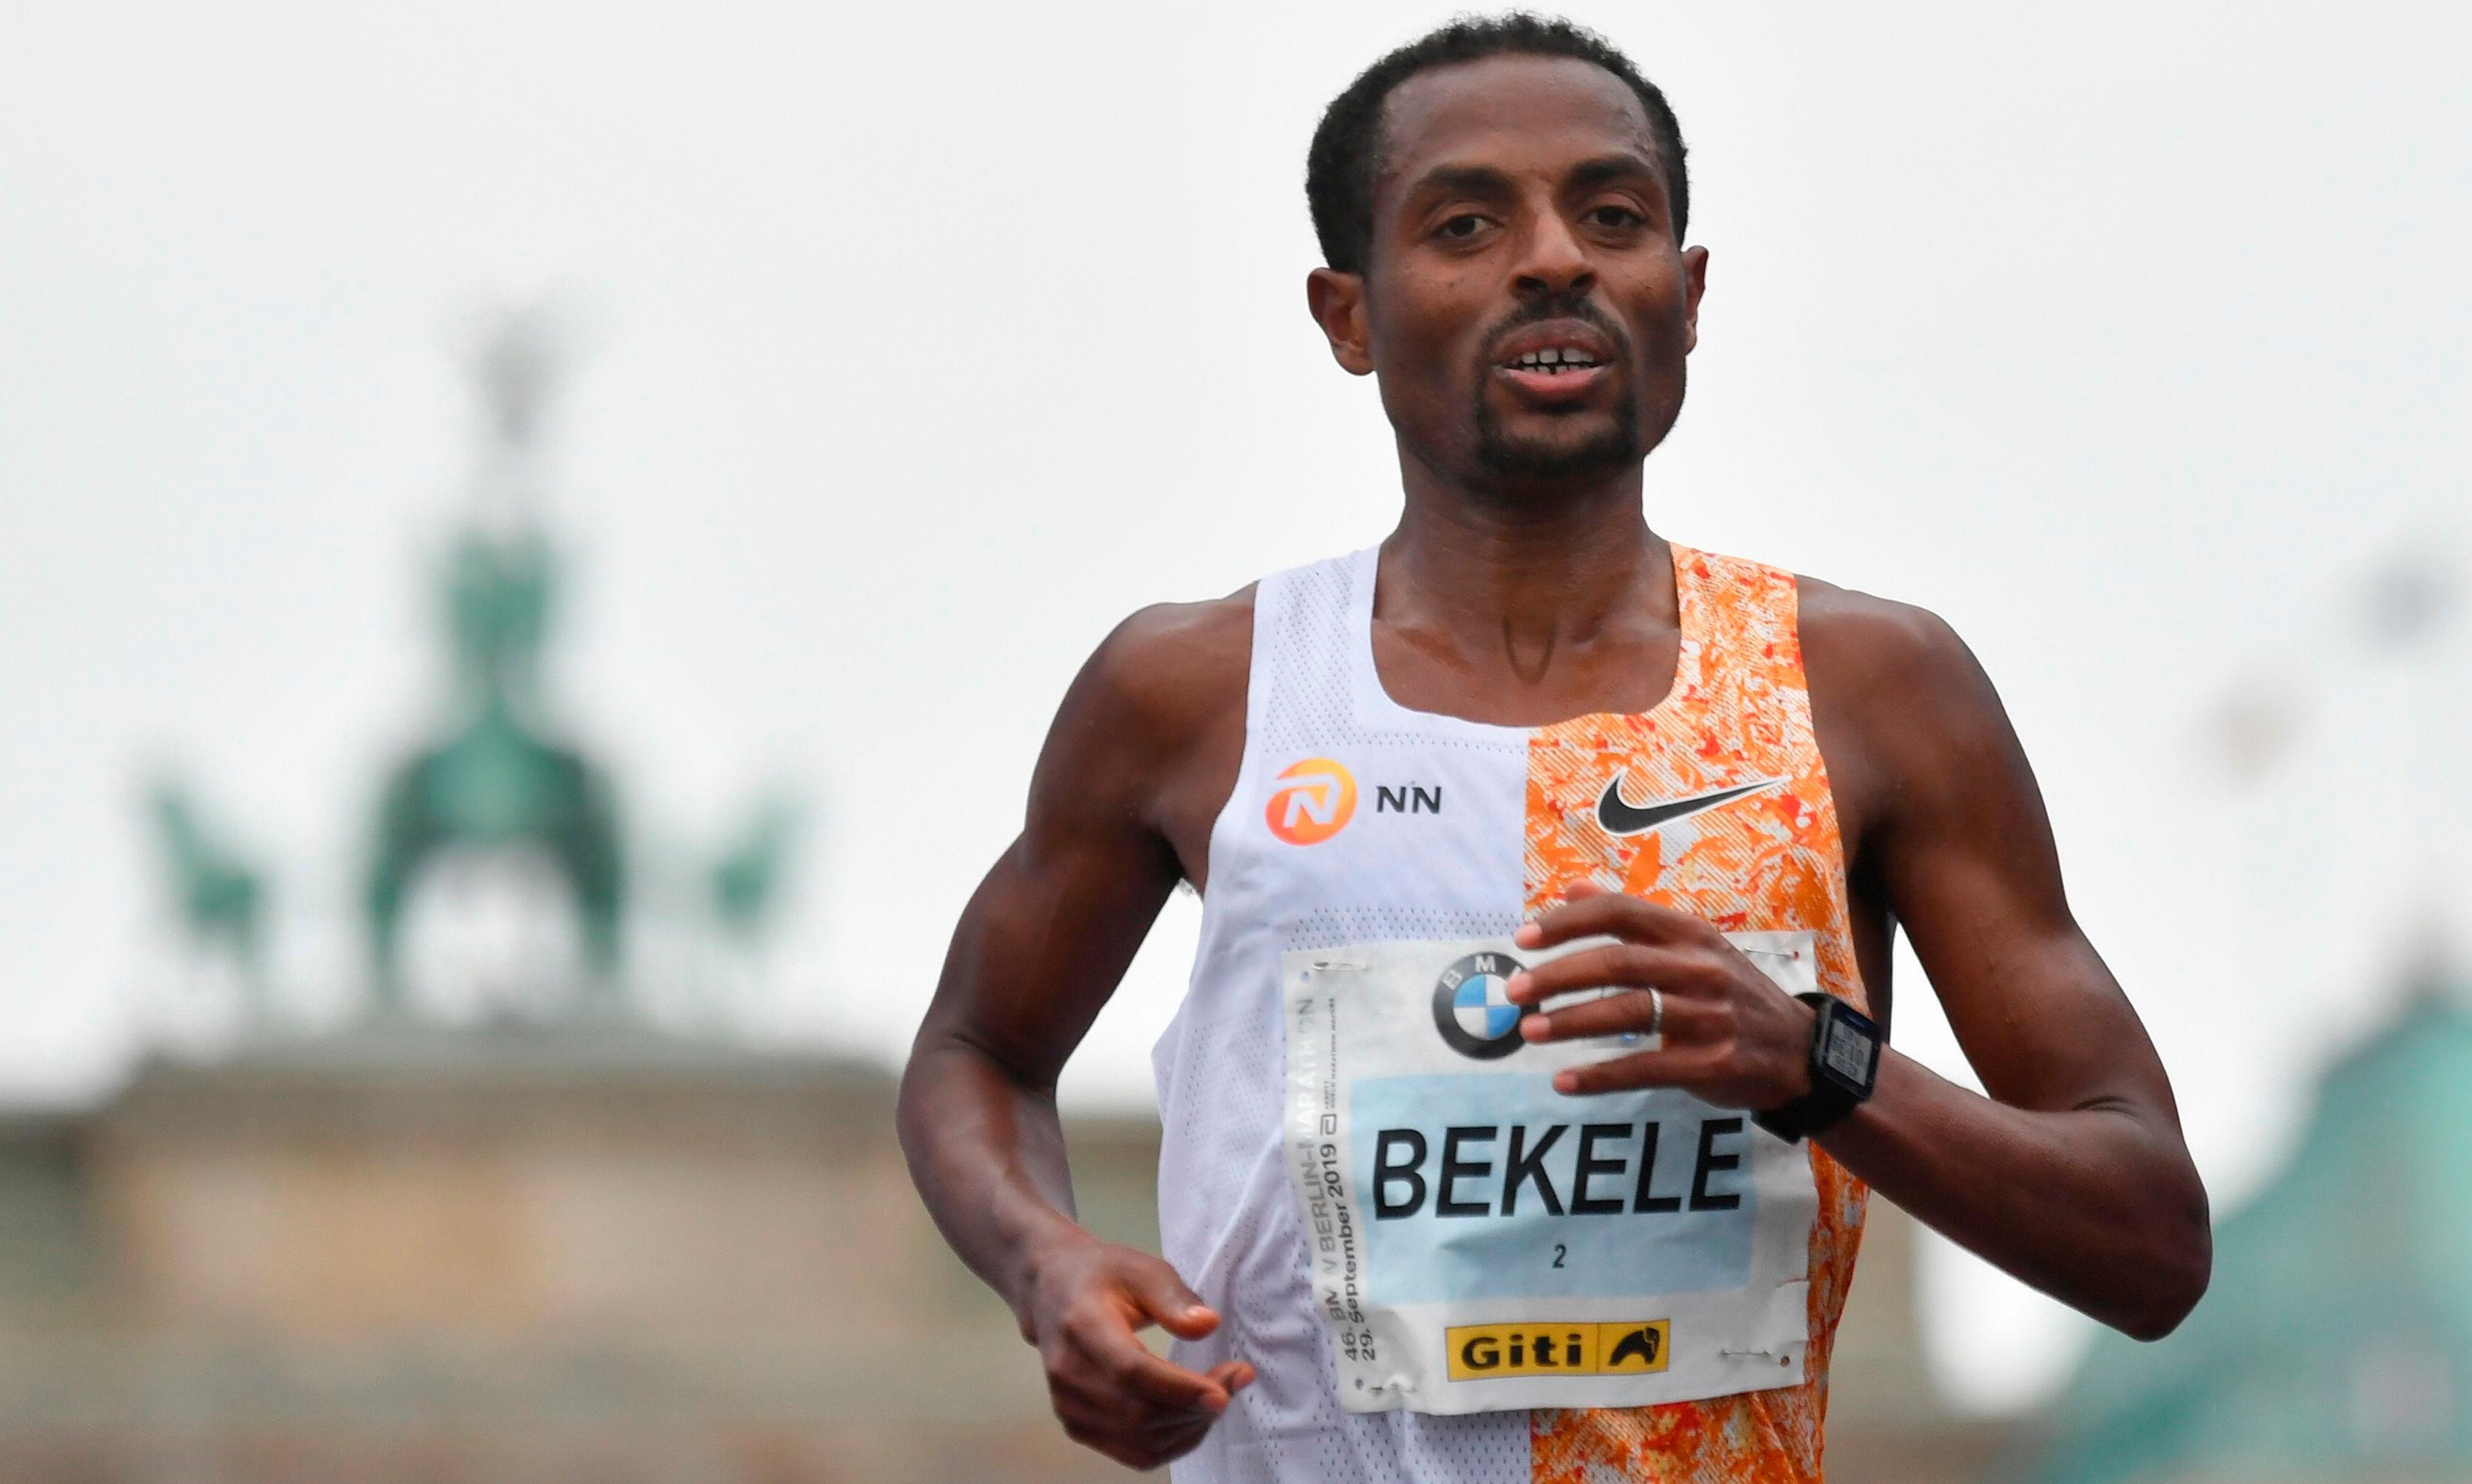 Kenenisa Bekele to face Eliud Kipchoge in London Marathon for the ages